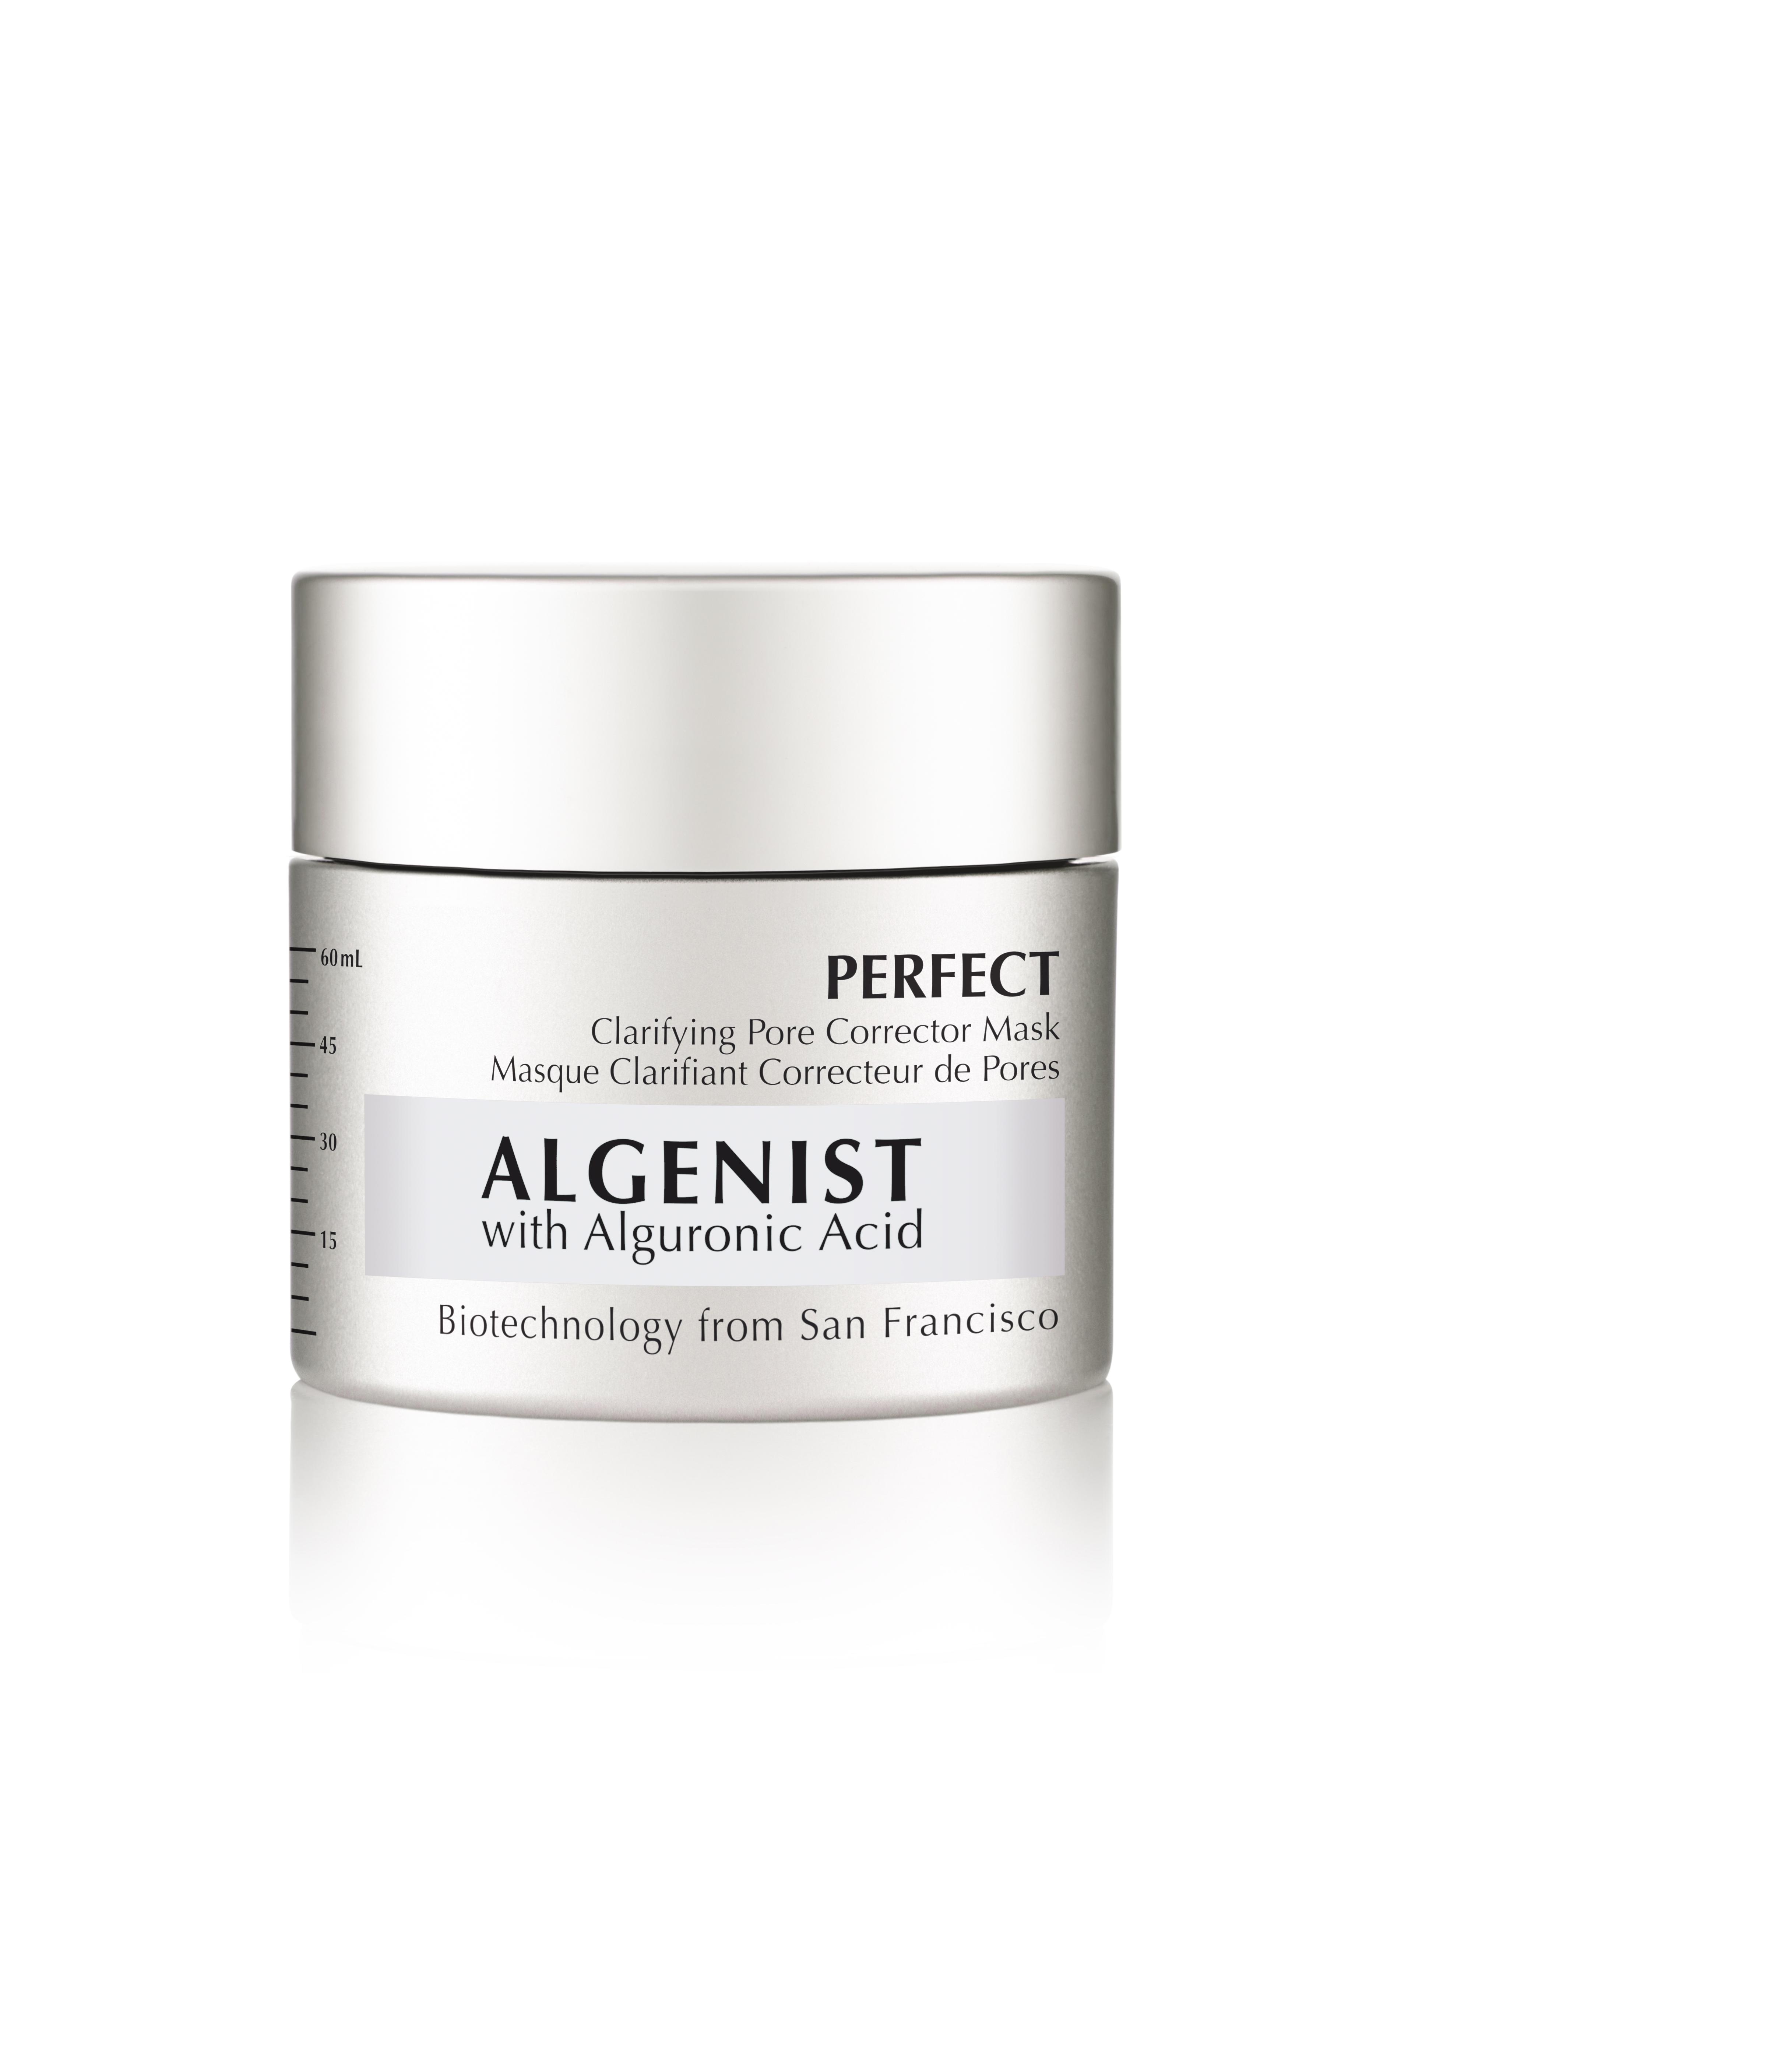 Algenist Perfect Clarifying Pore Corrector Mask, 60 ml